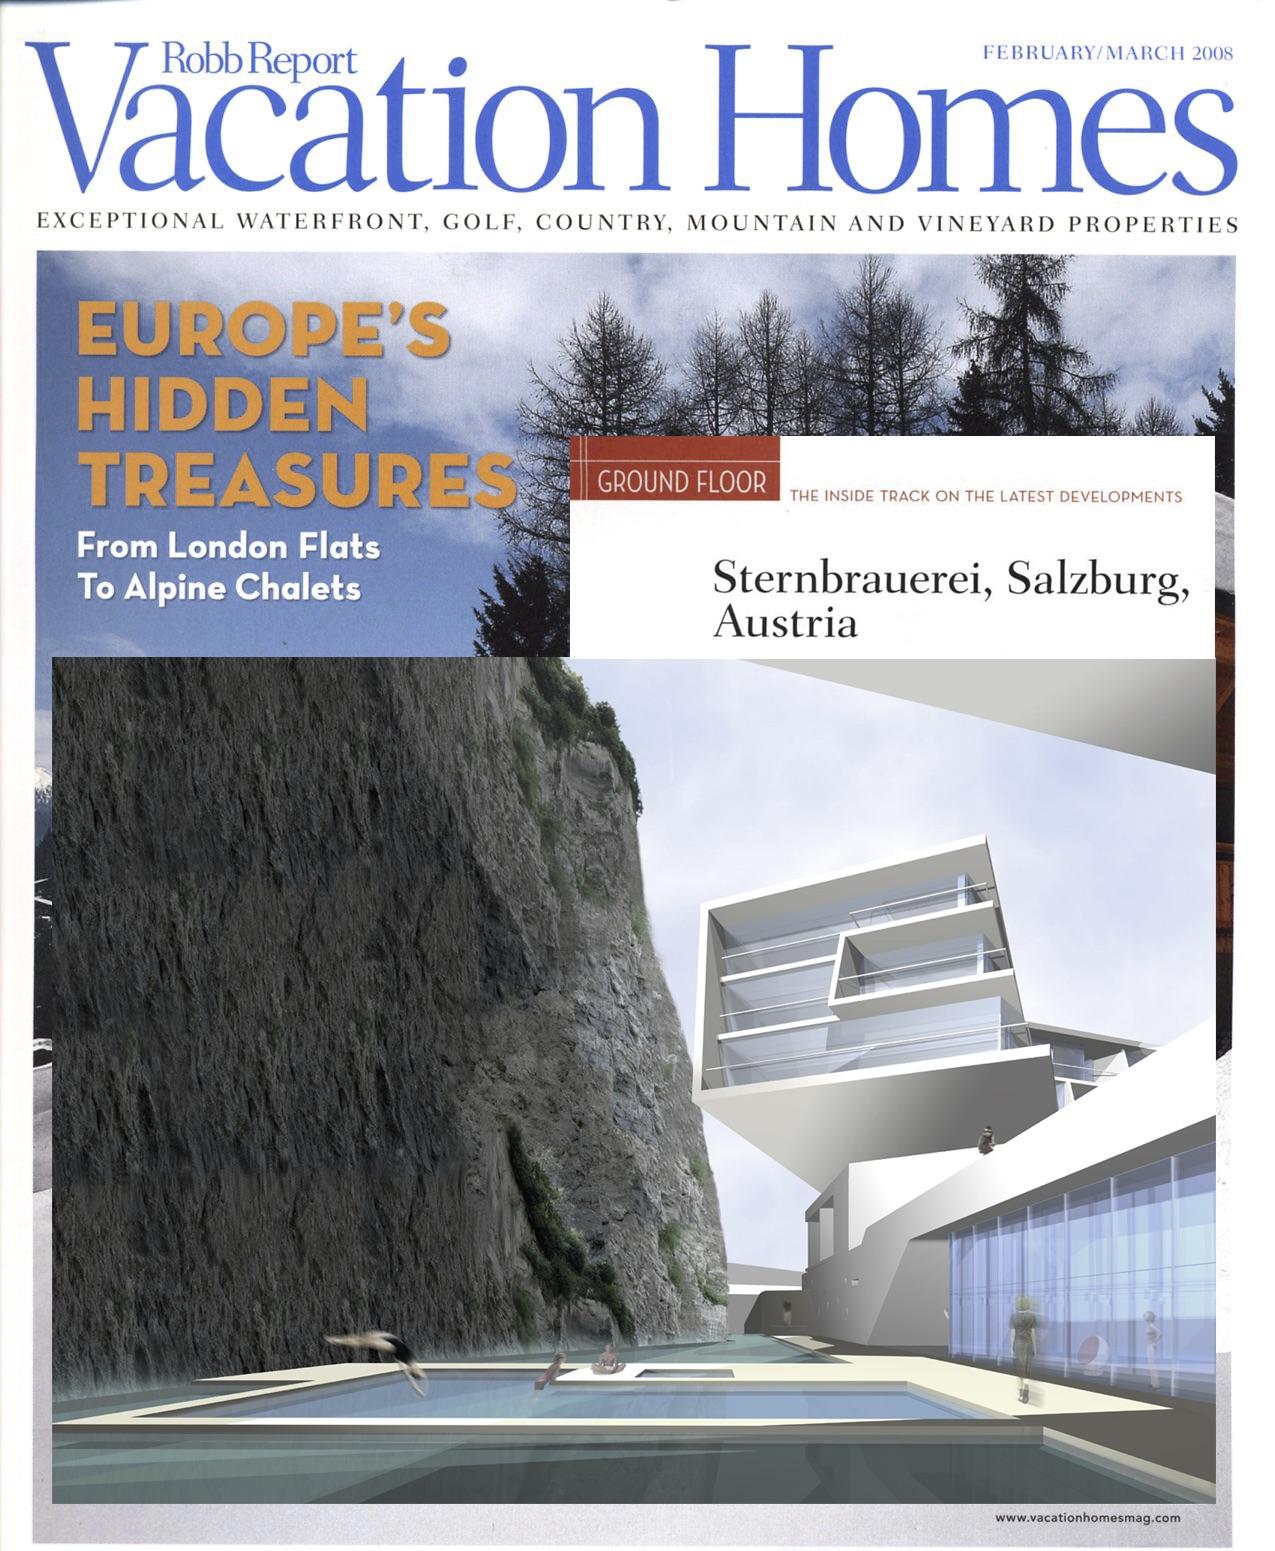 02.08 ROBB REPORT VACATION HOMES (SALZBURG)